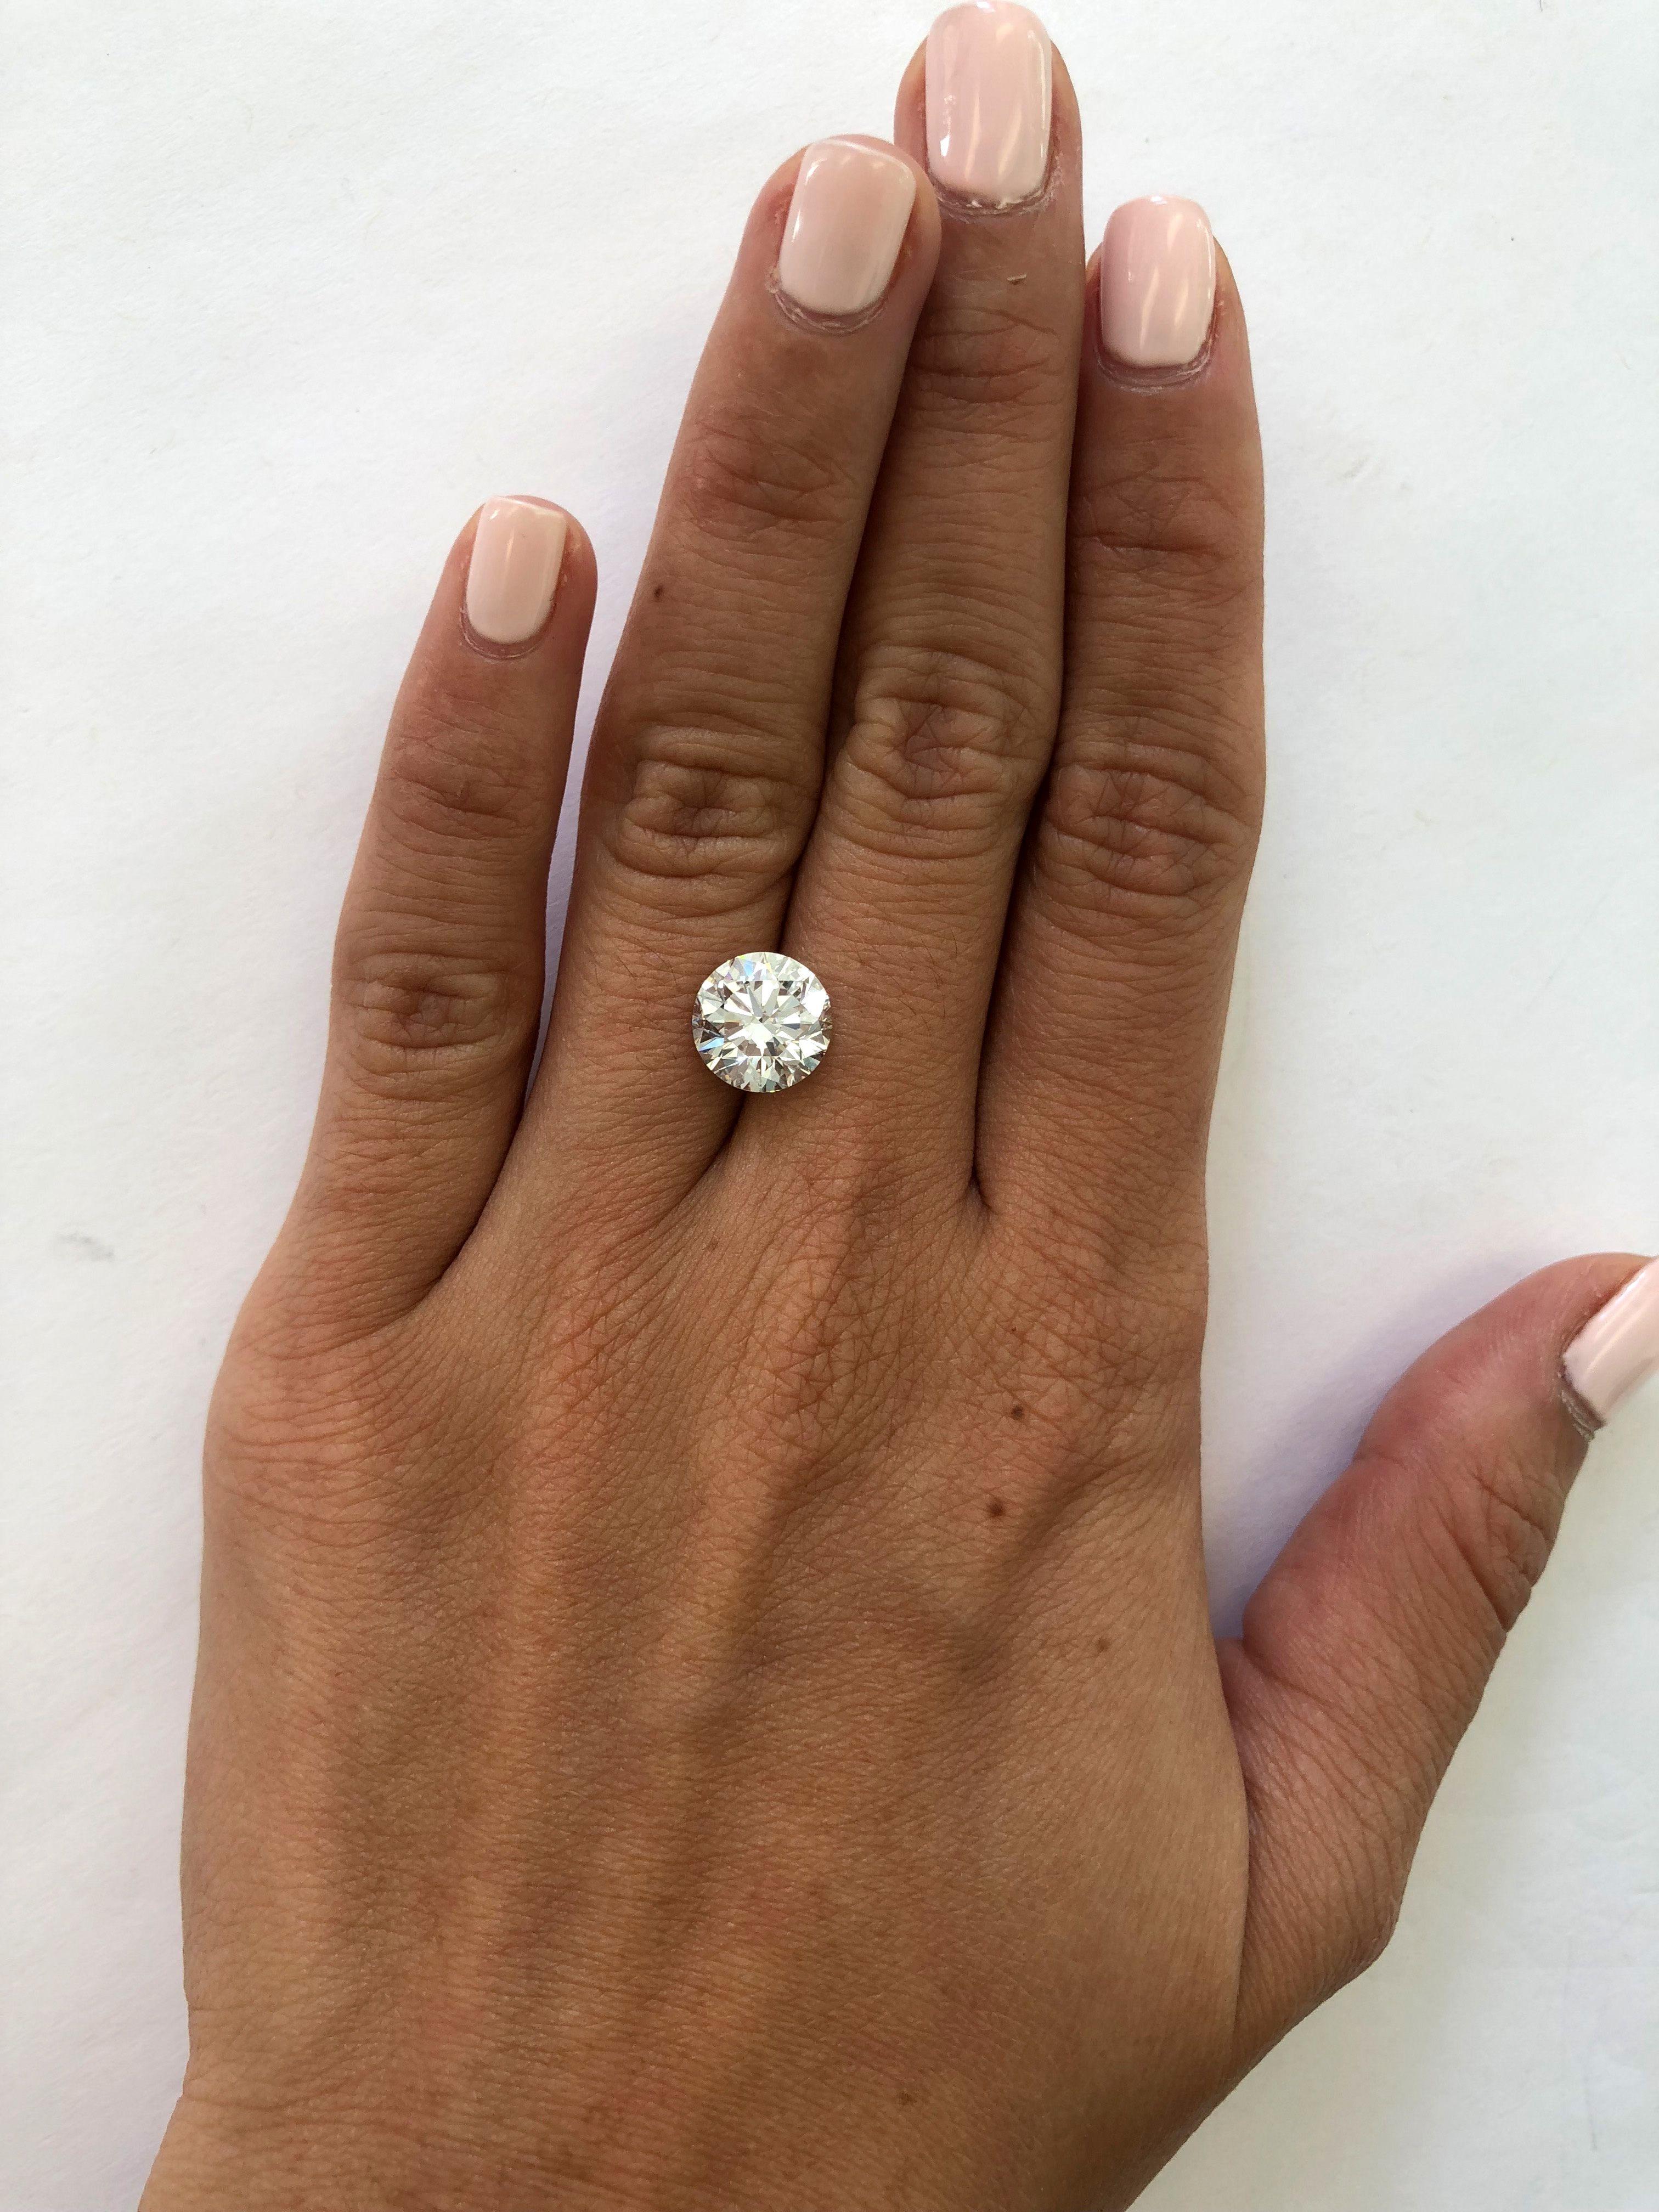 Tiny Engagement Ring Meme